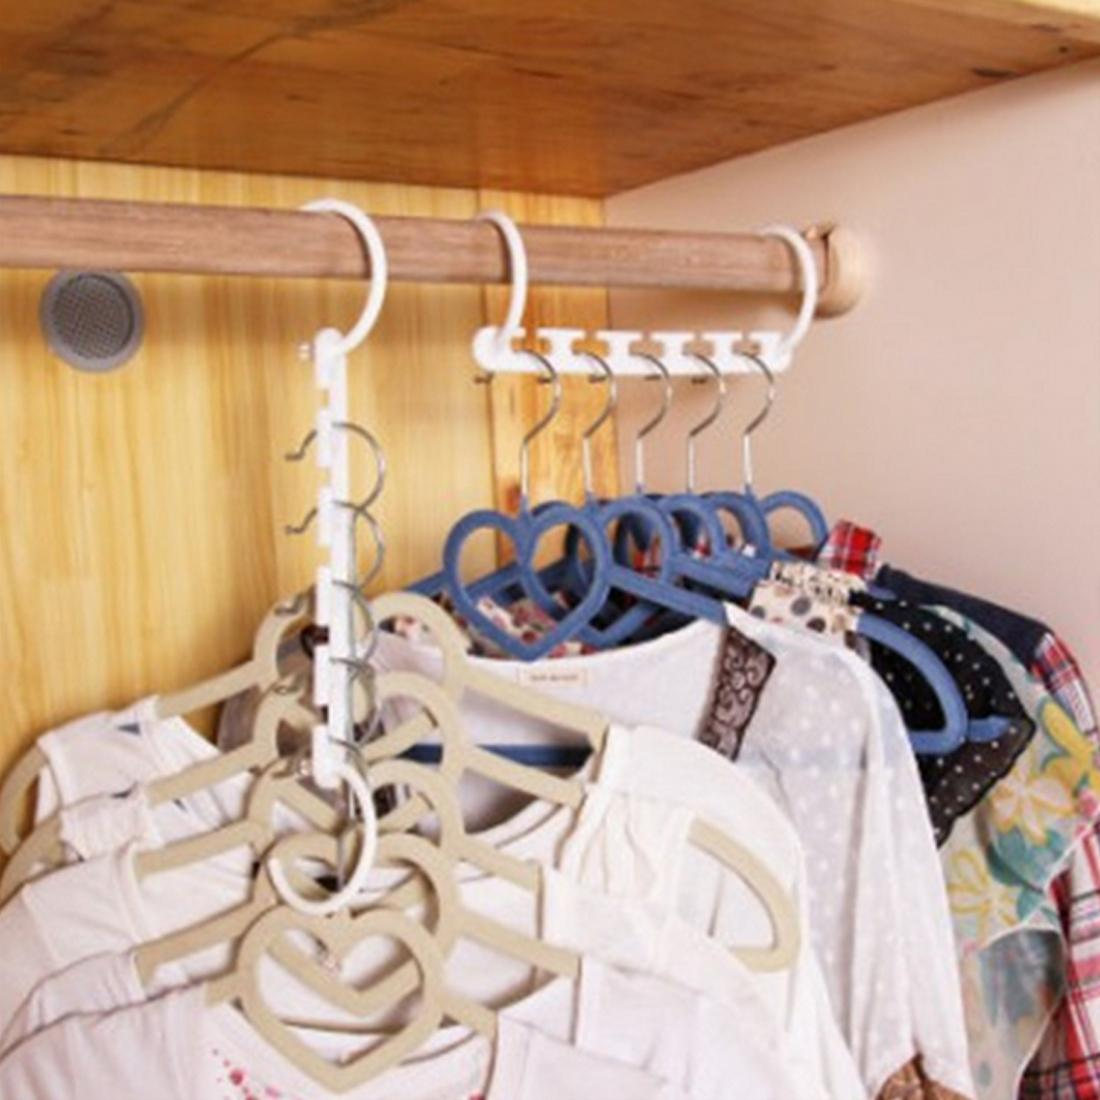 Useful 1pc Space Saving Hanger Plastic Cloth Hanger Hook Magic Clothes Hanger With Hook Closet Organizer